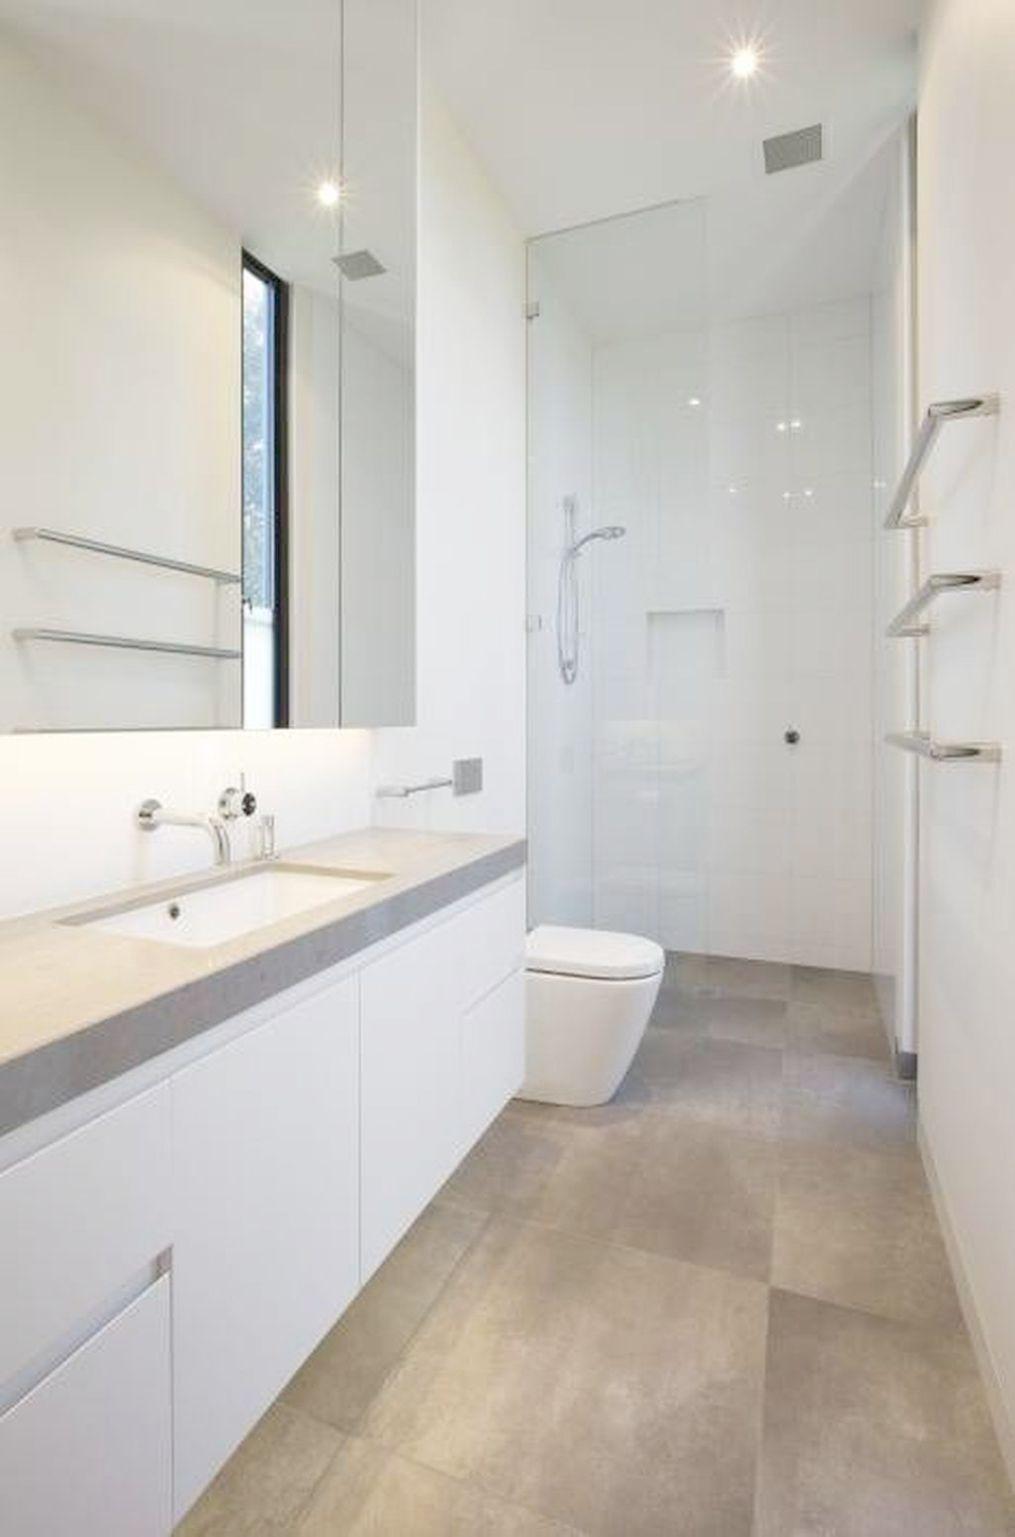 Google Image Result In 2020 Modern Small Bathrooms Bathroom Design Small Long Narrow Bathroom